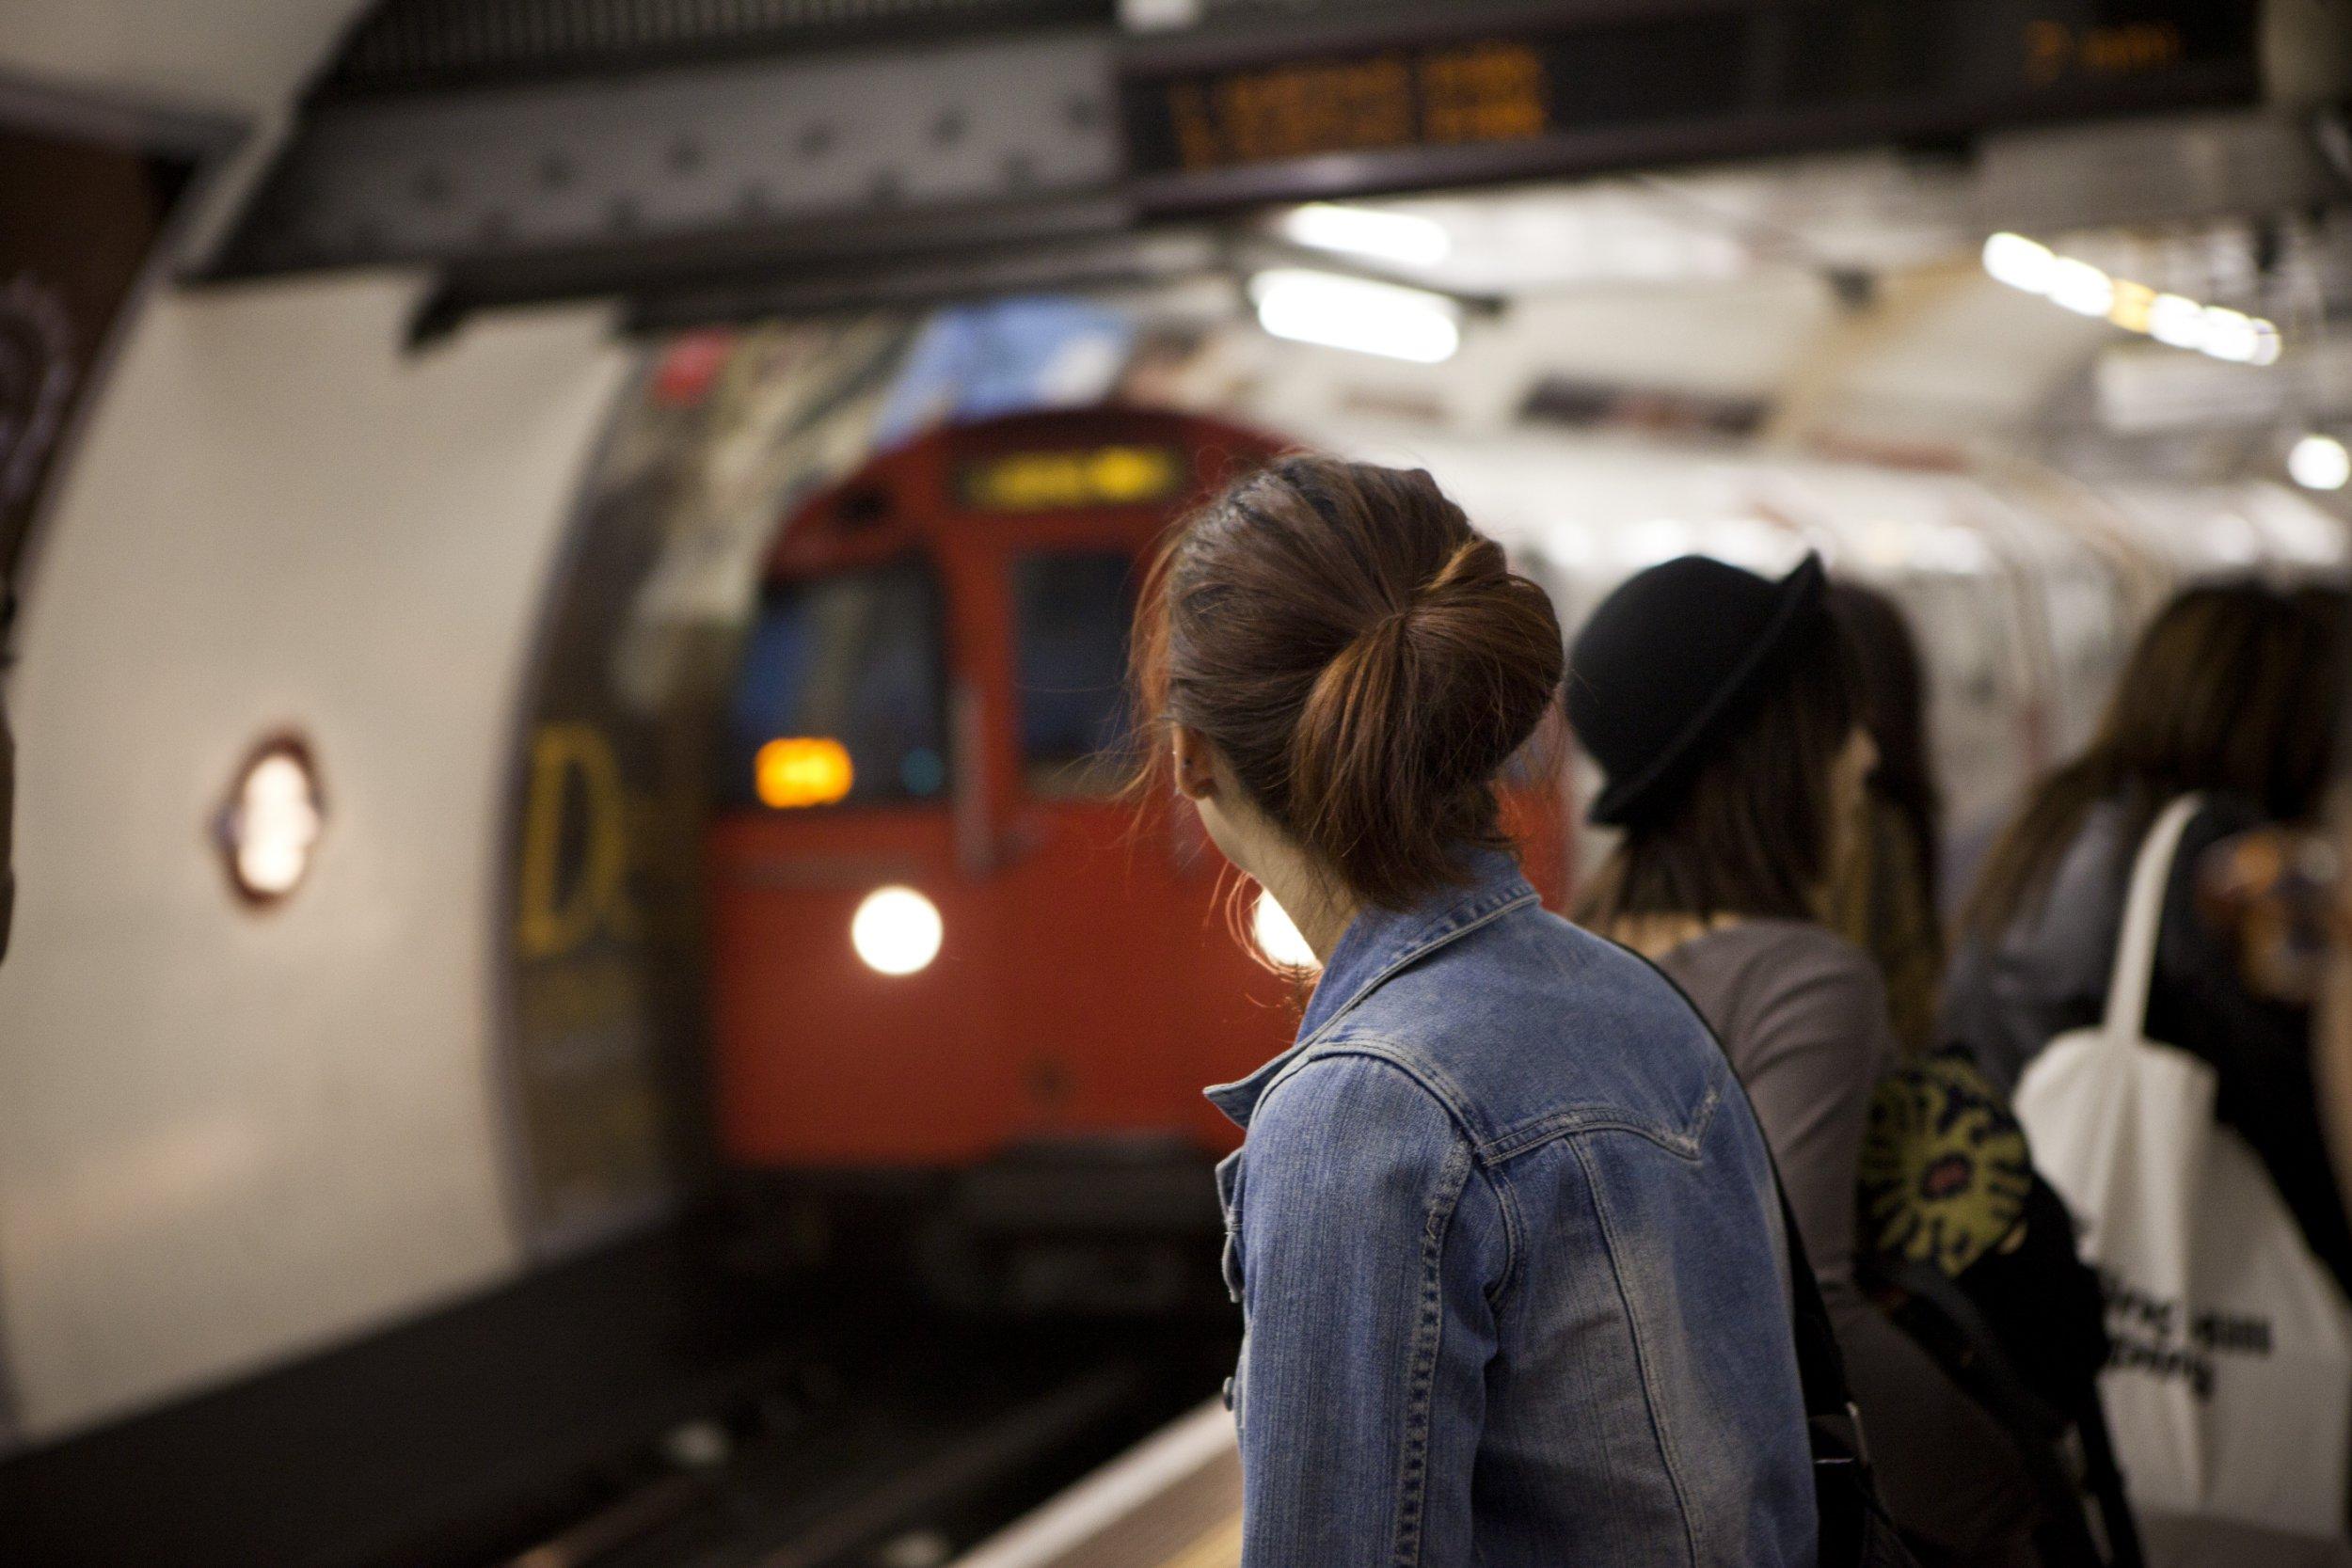 People waiting on London underground platform.